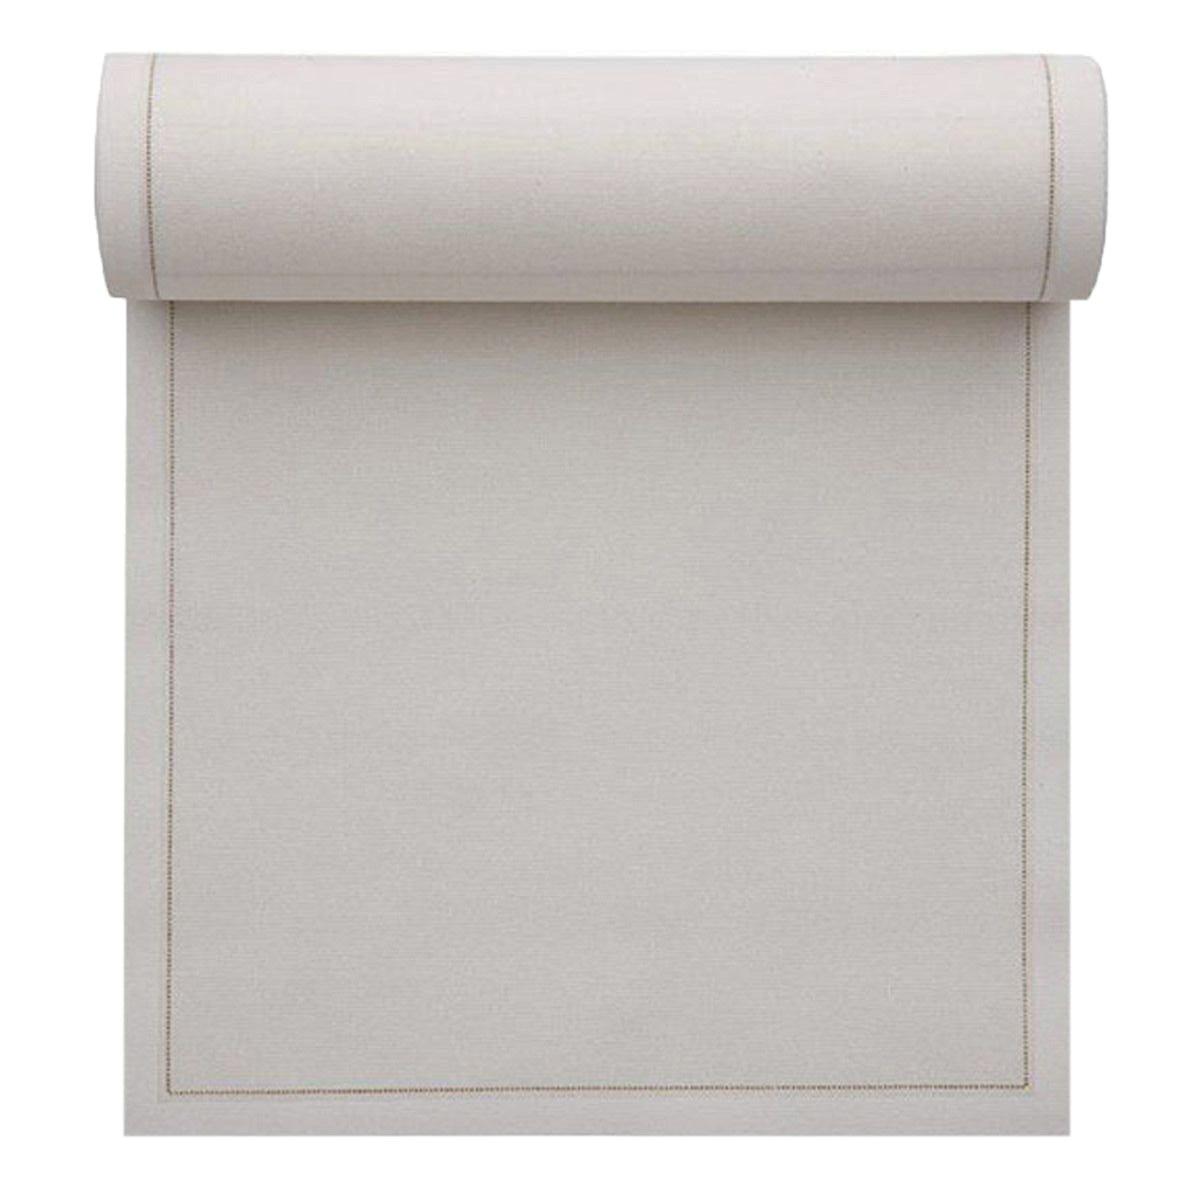 Cotton Dinner Napkin - 12.6 x 12.6 in - 12 units per roll - Ecru by MYdrap (Image #1)